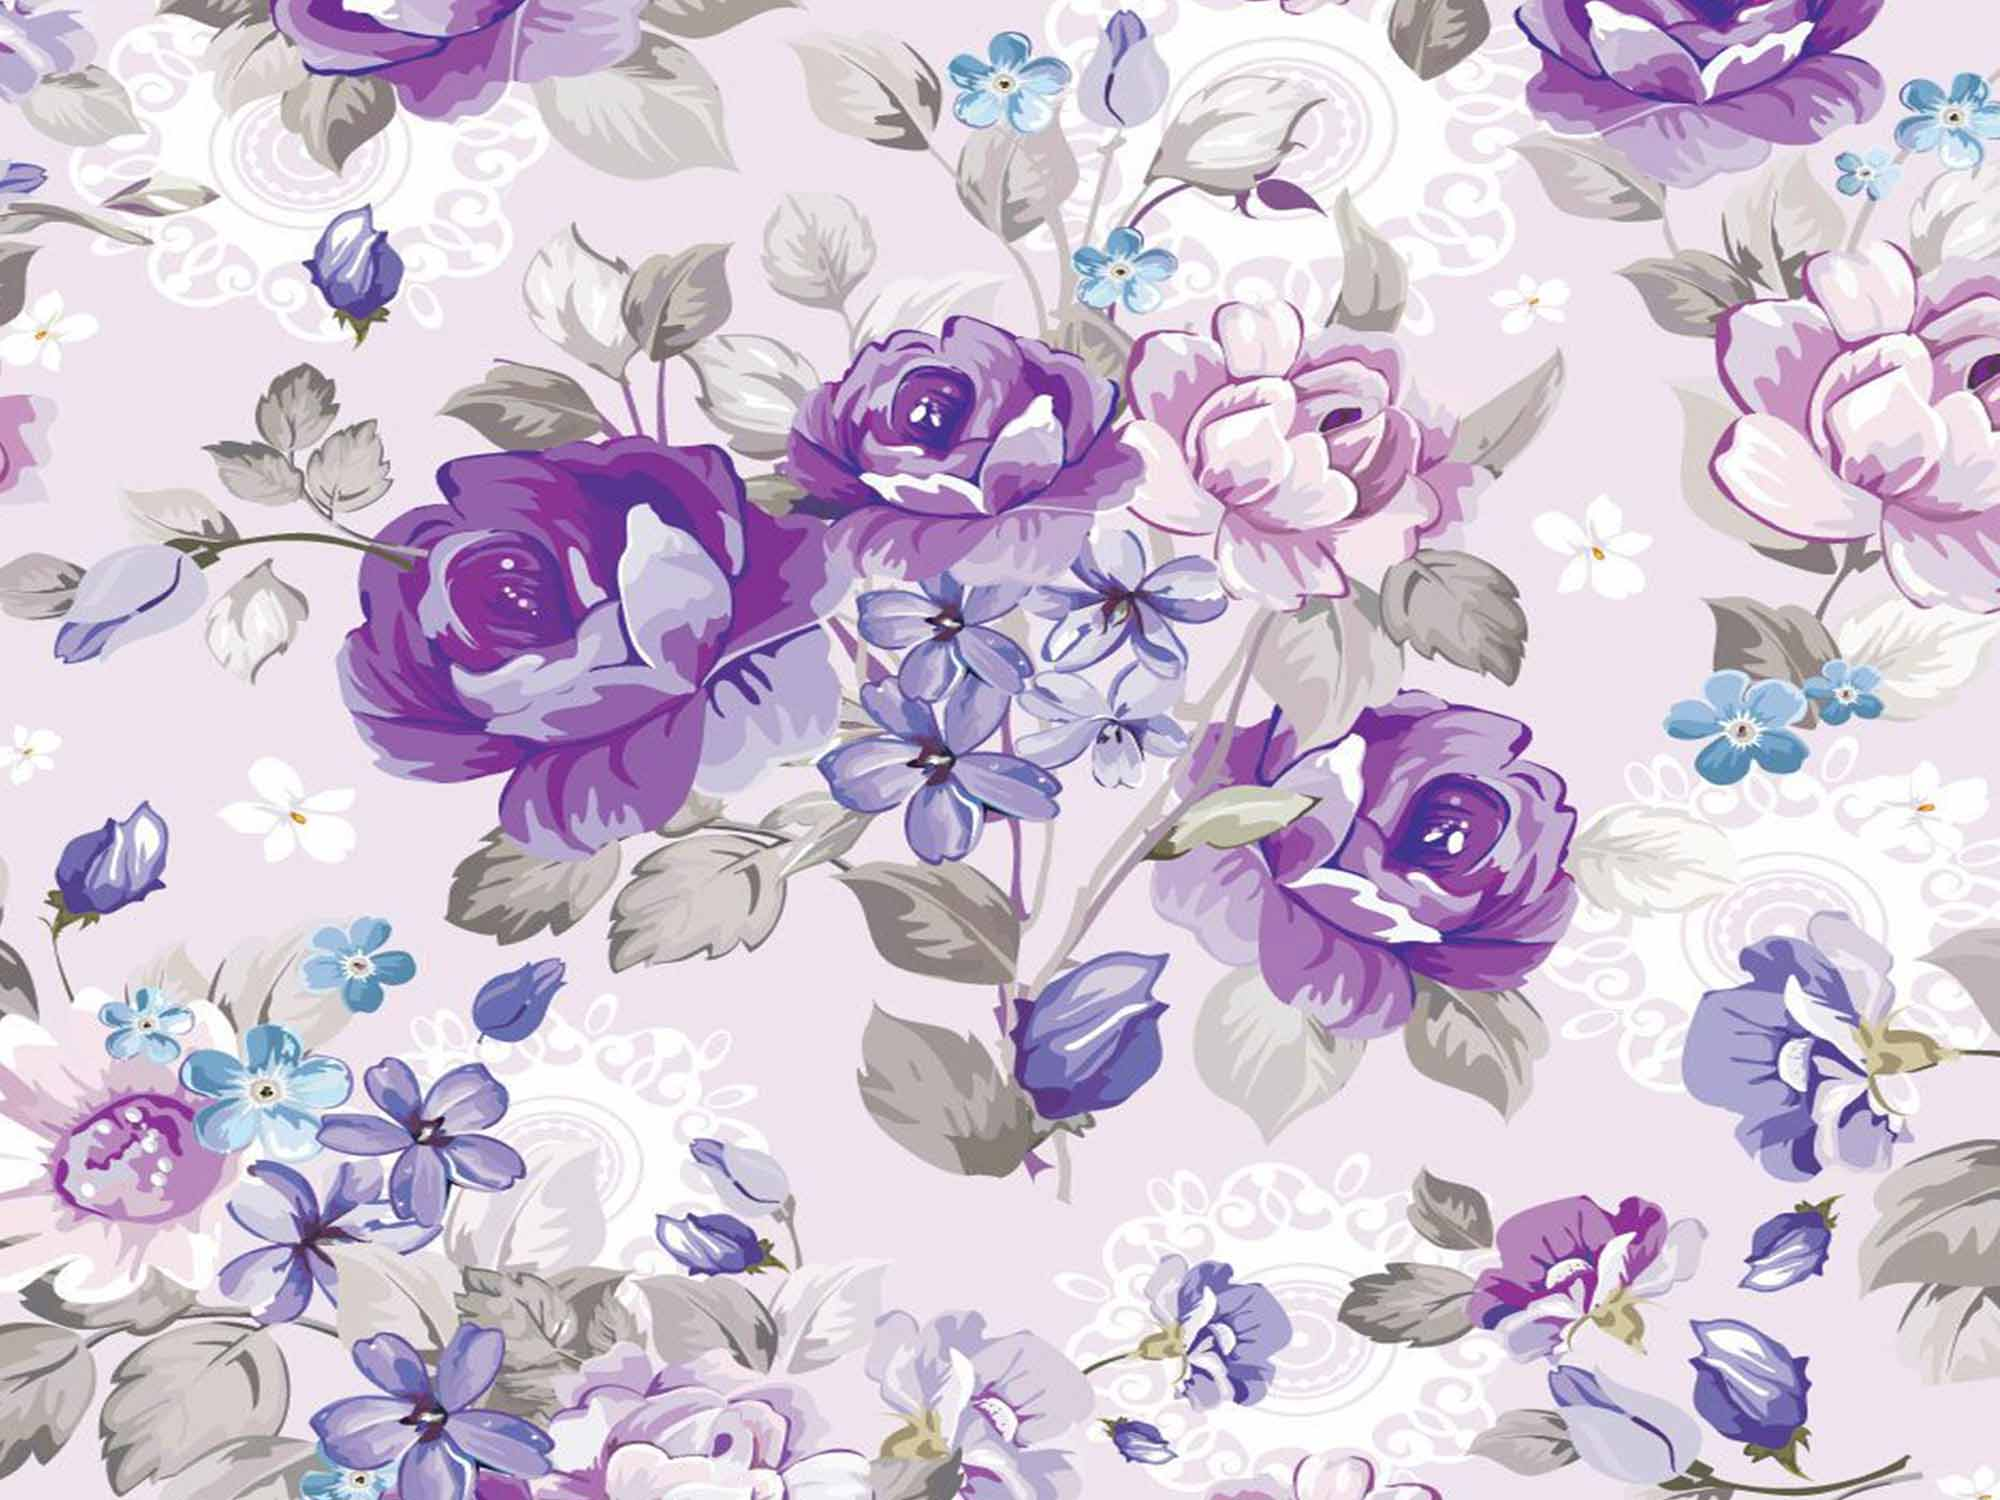 Papel de Parede Floral 0096 - Adesivos de Parede  - Paredes Decoradas